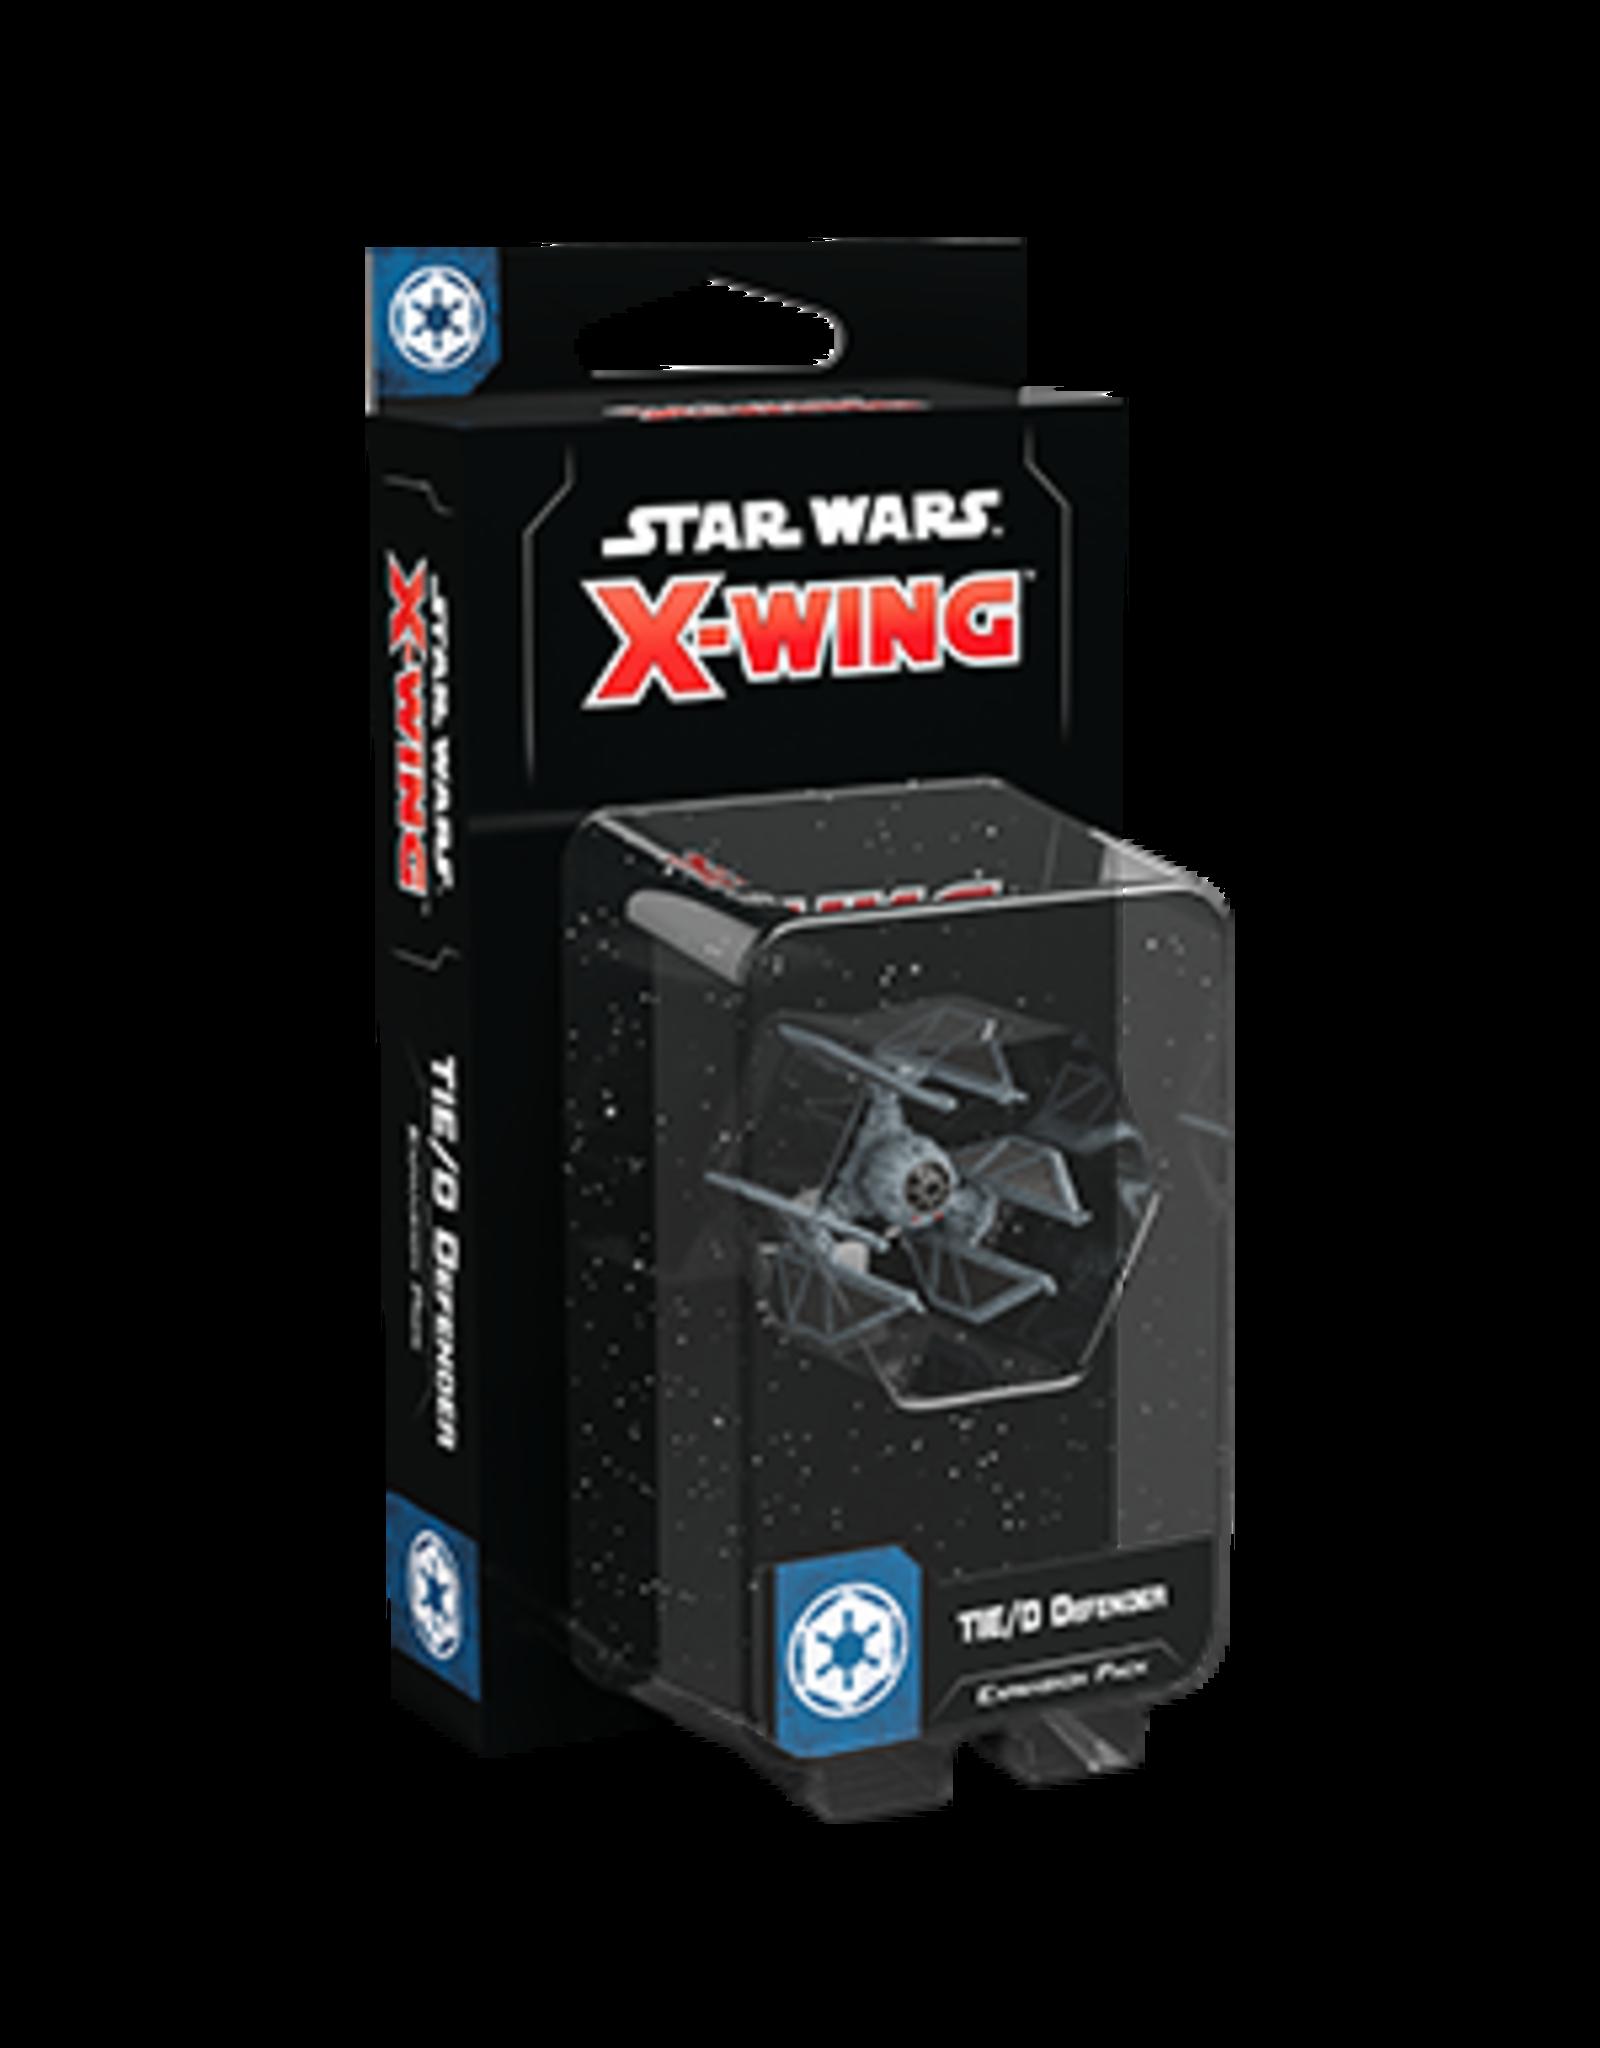 Fantasy Flight Games Star Wars X-Wing: 2nd Edition - TIE/D Defender Expansion Pack